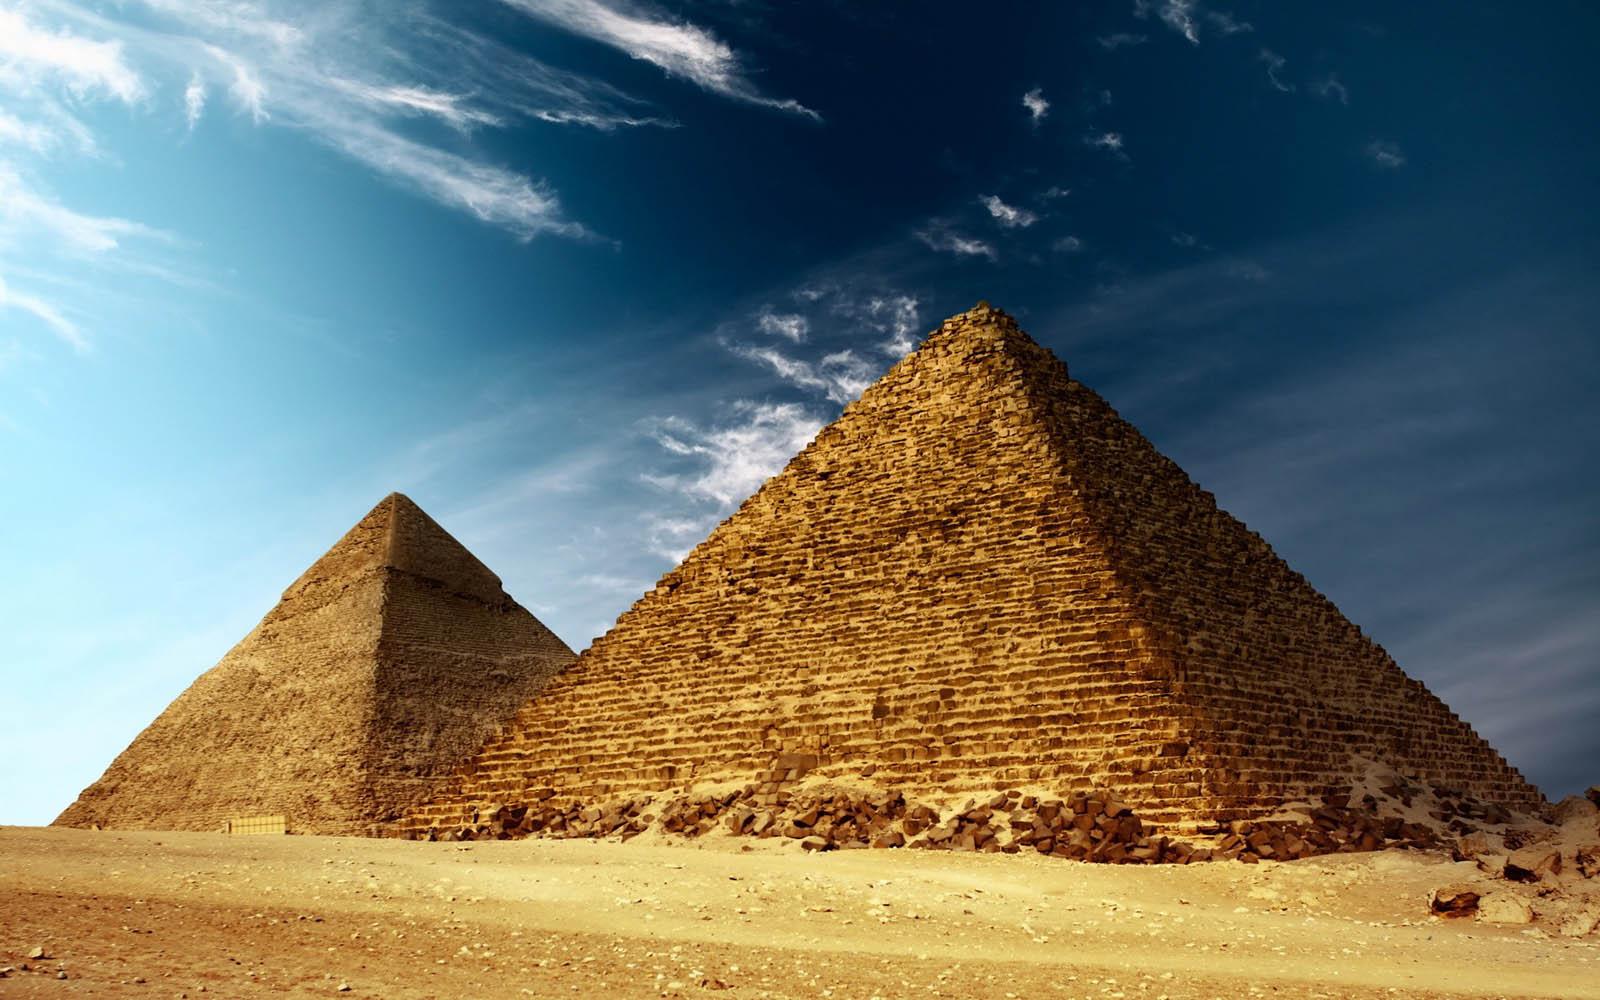 egypt pyramids wallpapers egypt pyramids desktop wallpapers egypt 1600x1000